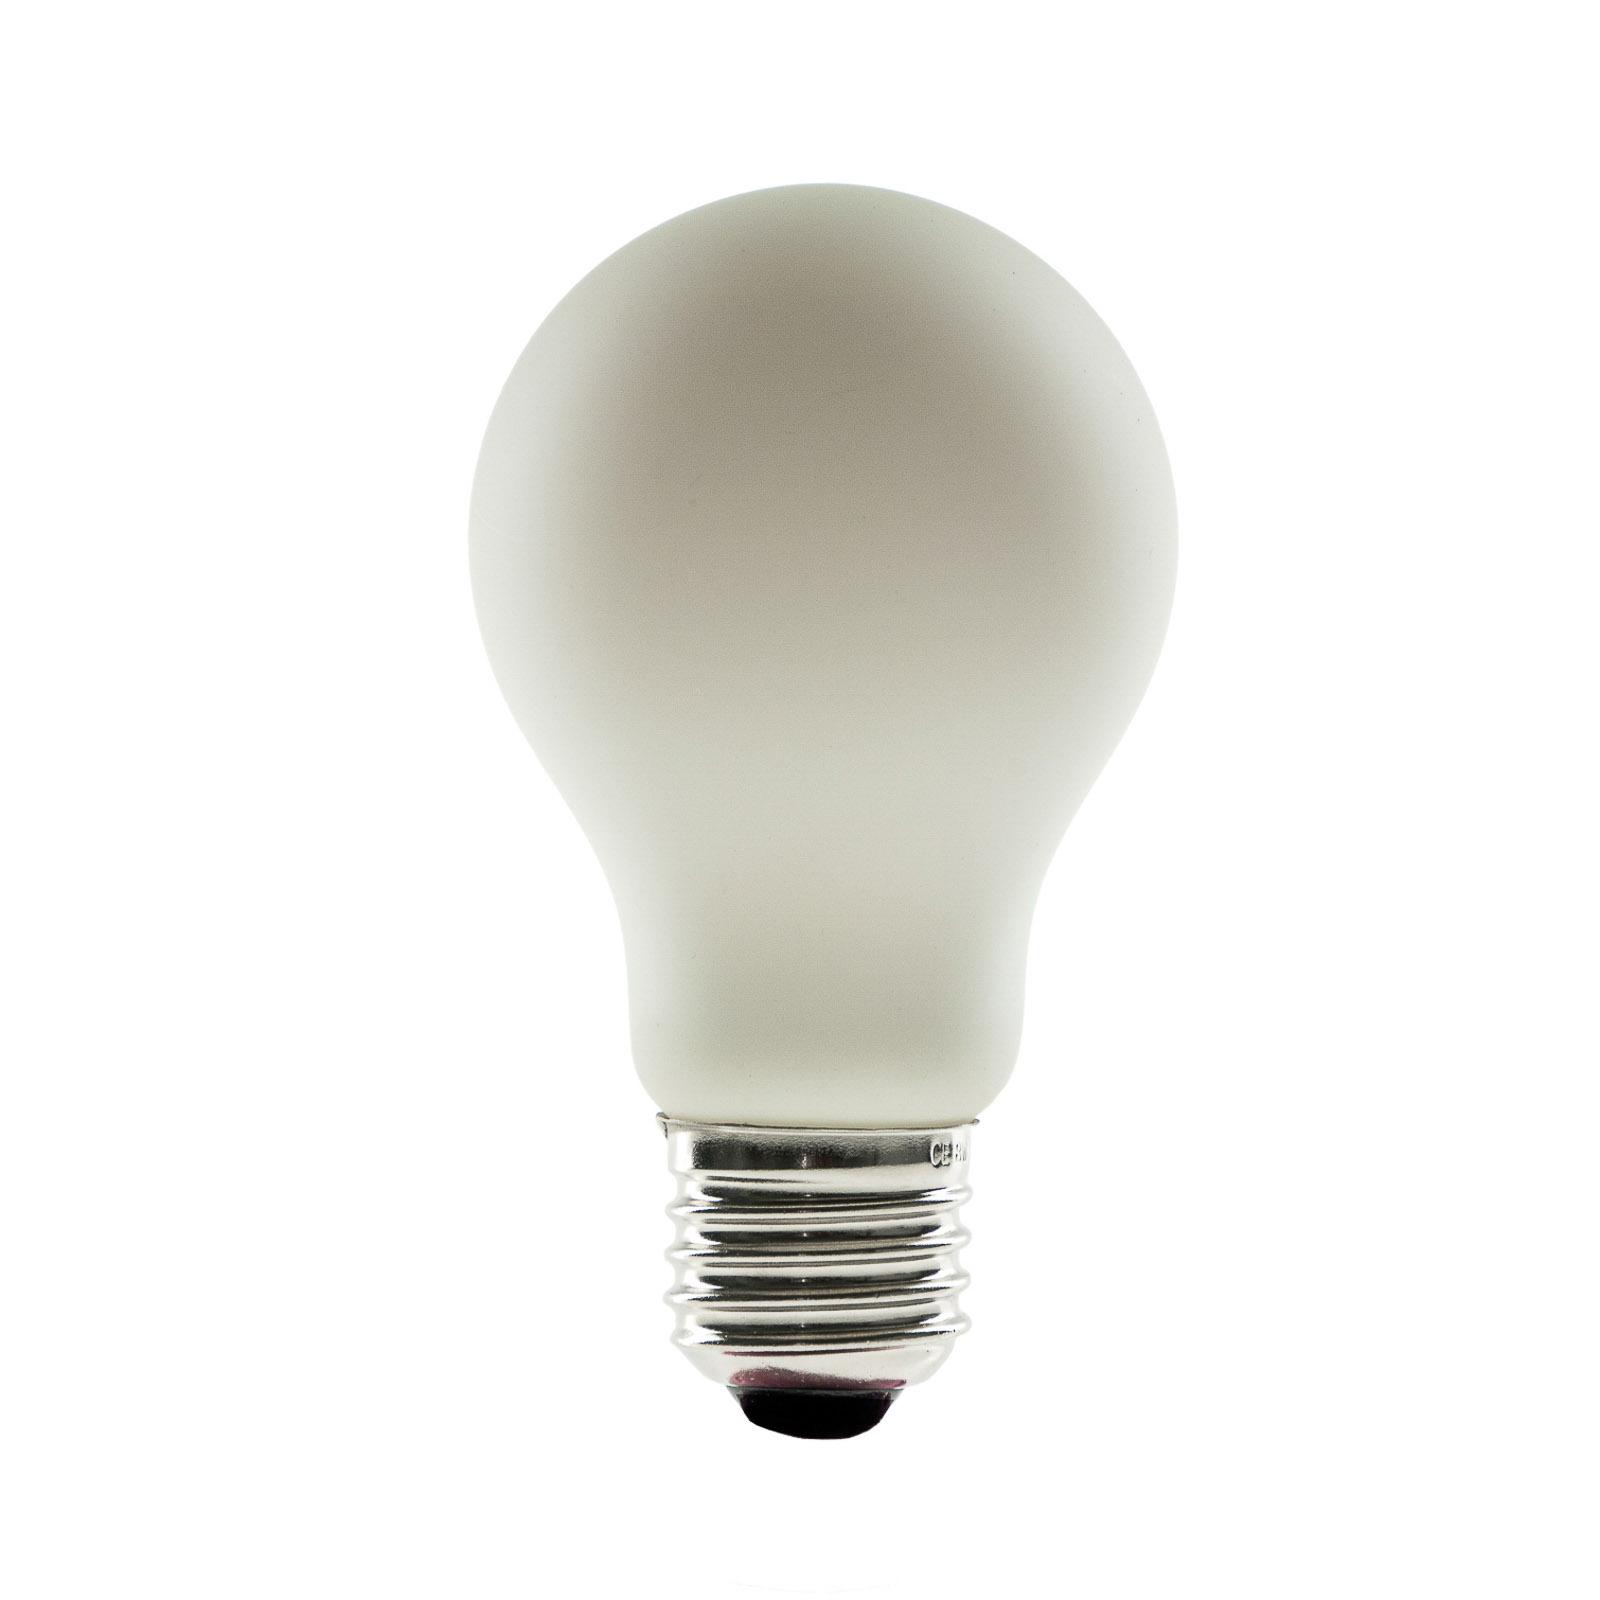 SEGULA LED-Lampe E27 8 W opal ambient dimming